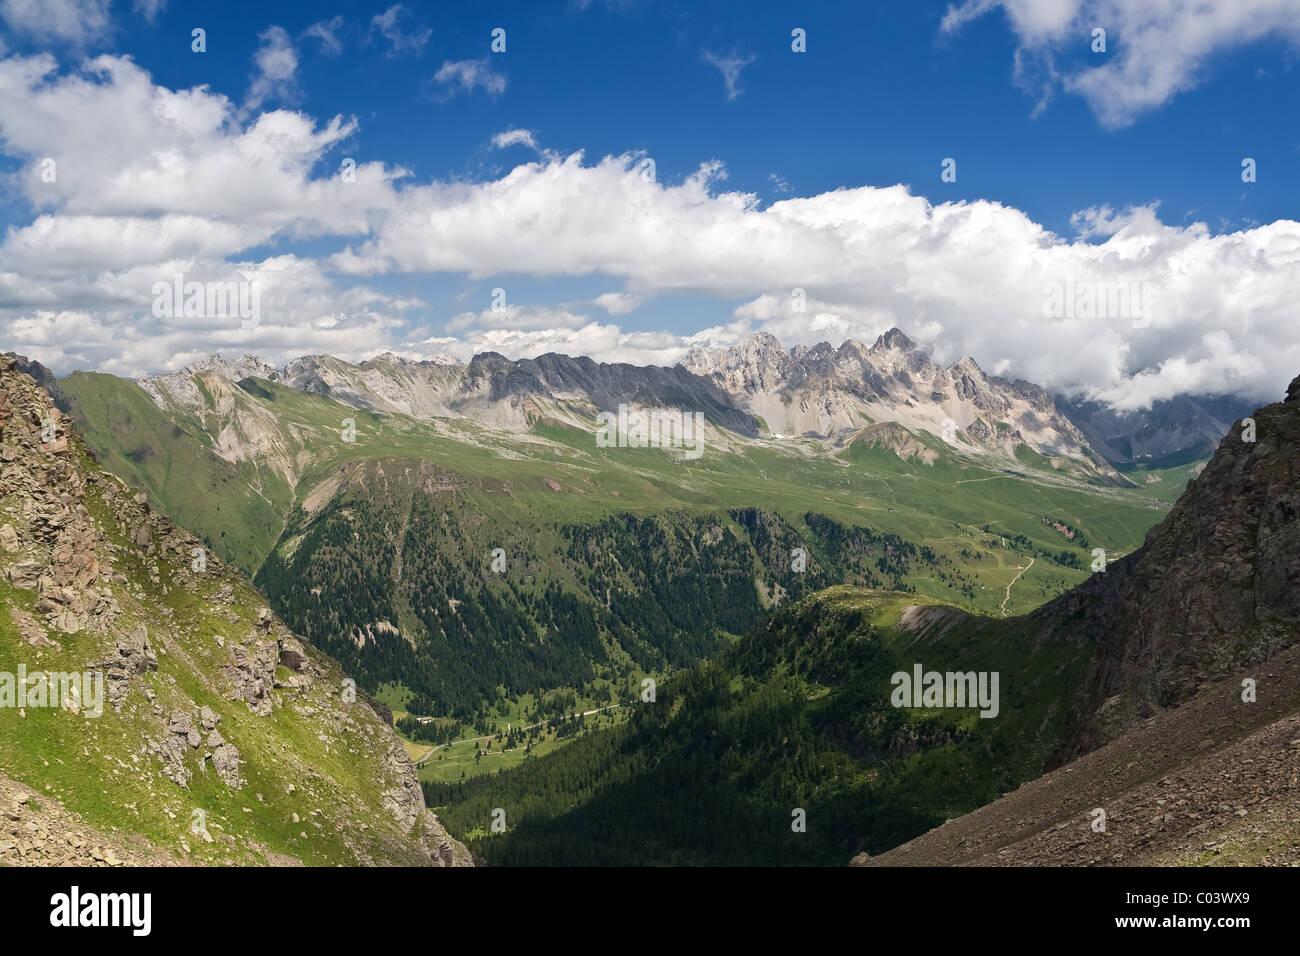 summer view of San Pellegrino Valley with Monzoni mountain in val di Fassa, Italian dolomites. Photo taken with Stock Photo